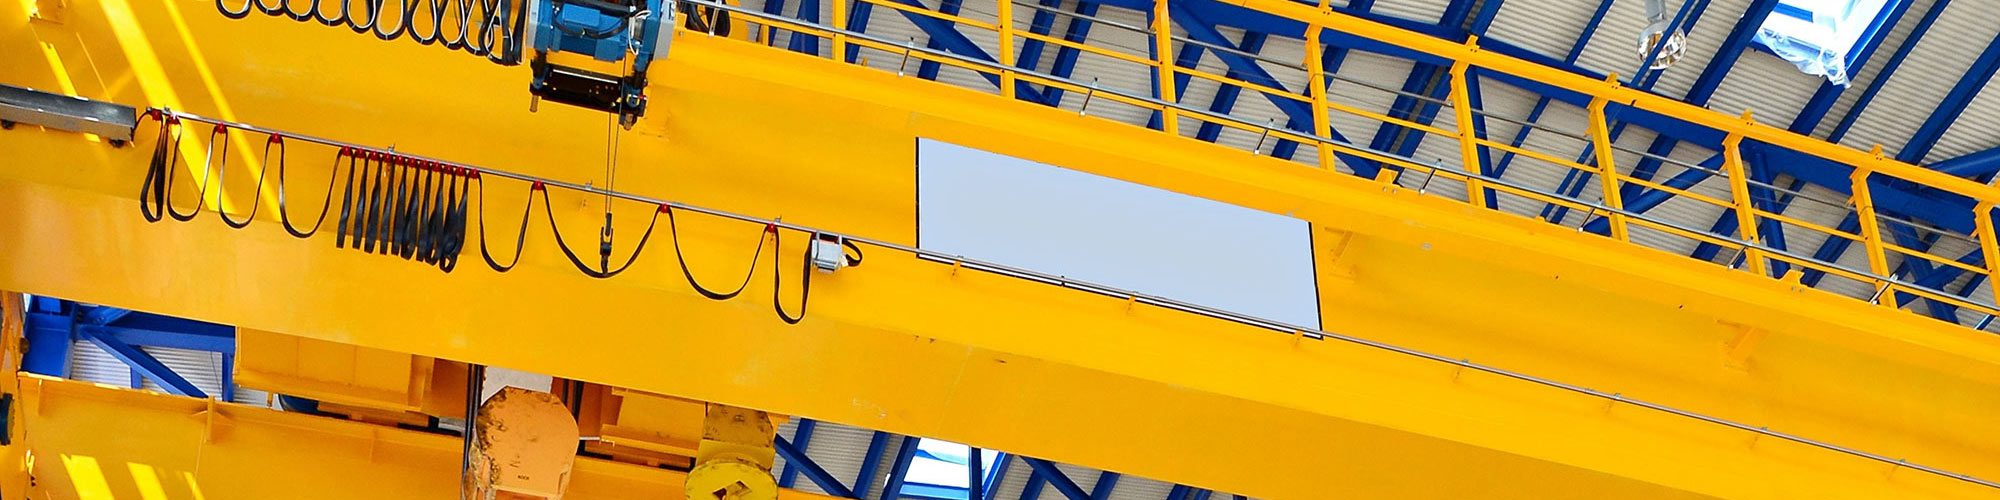 Crane and lifting technology